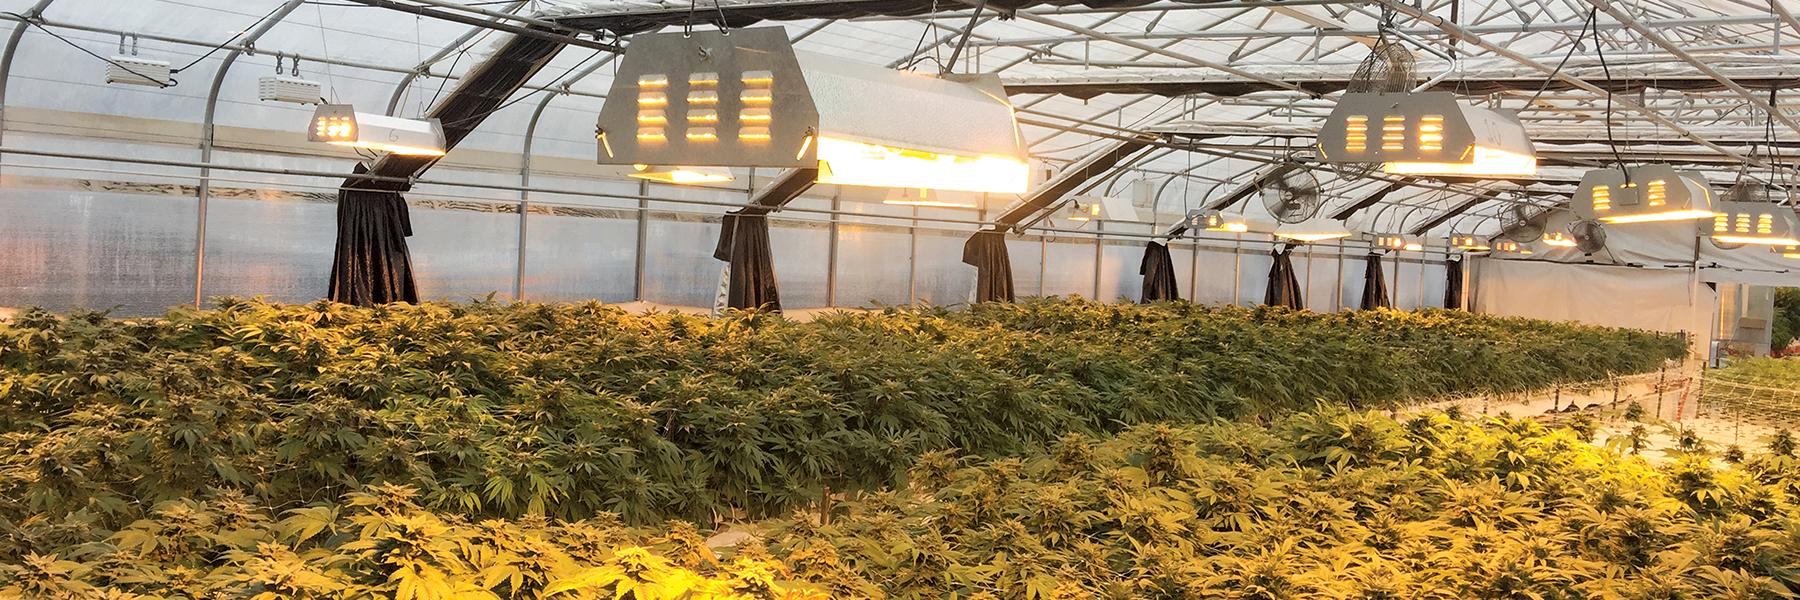 Greener Cannabis Cultivation